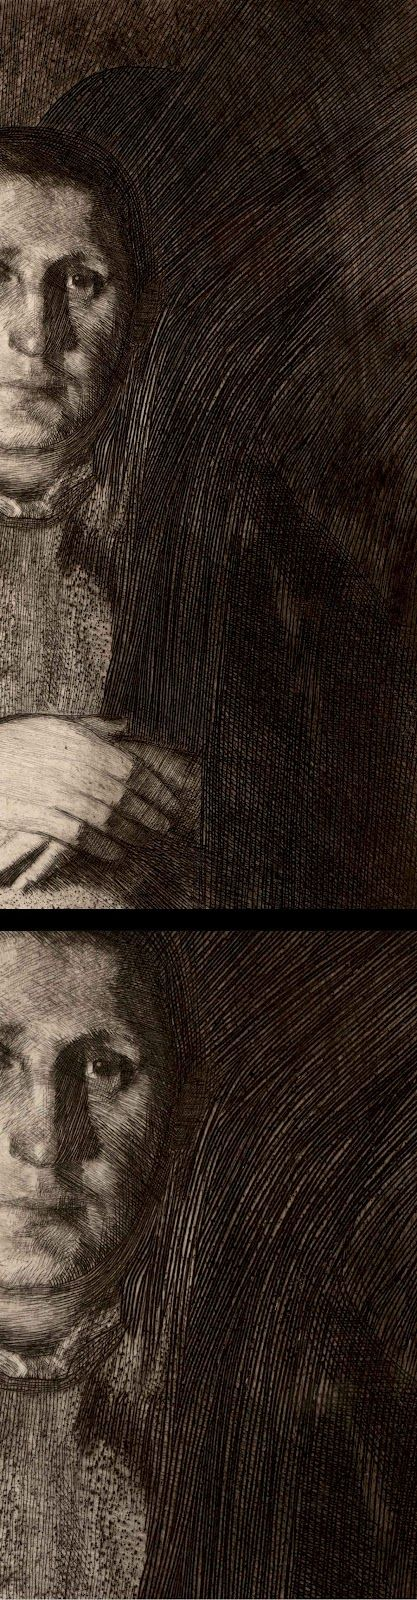 Käthe Kollwitz, (detail) #etching, dry point and soft ground .. Love her work .. Beautiful